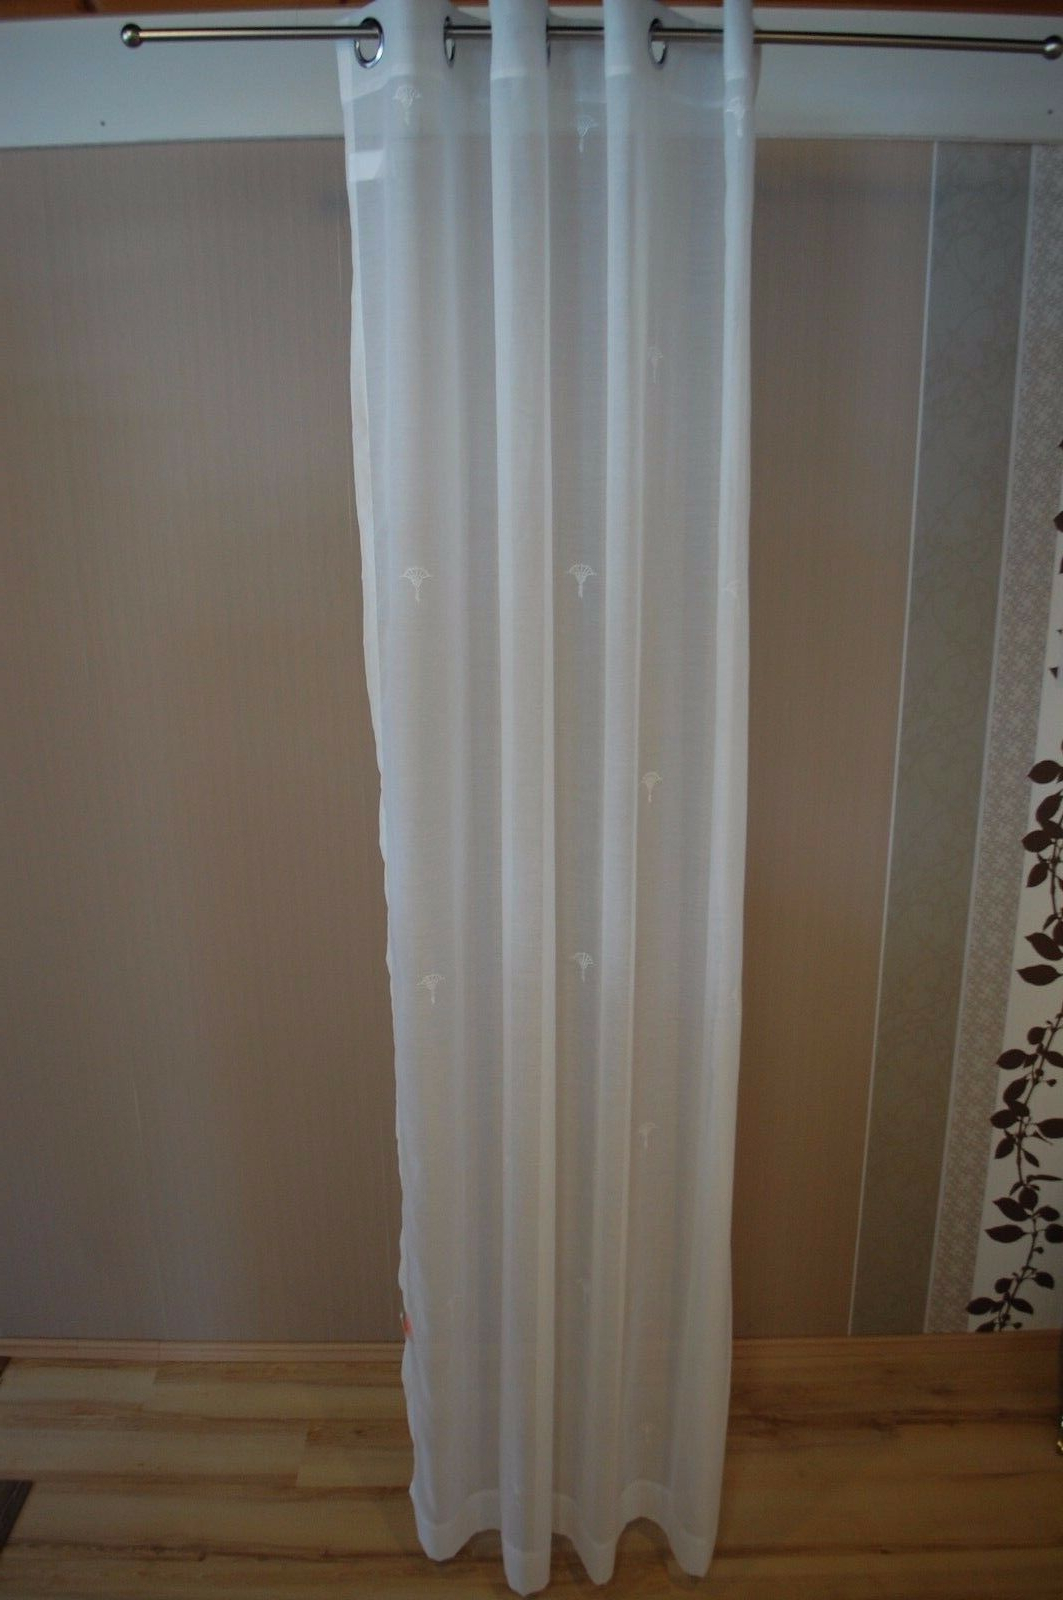 2020 Joop Gardine Vorhang Nola 001 Weiß Weiß Weiß 140x250 Cm In Softline Trenton Grommet Top Curtain Panels (View 14 of 20)